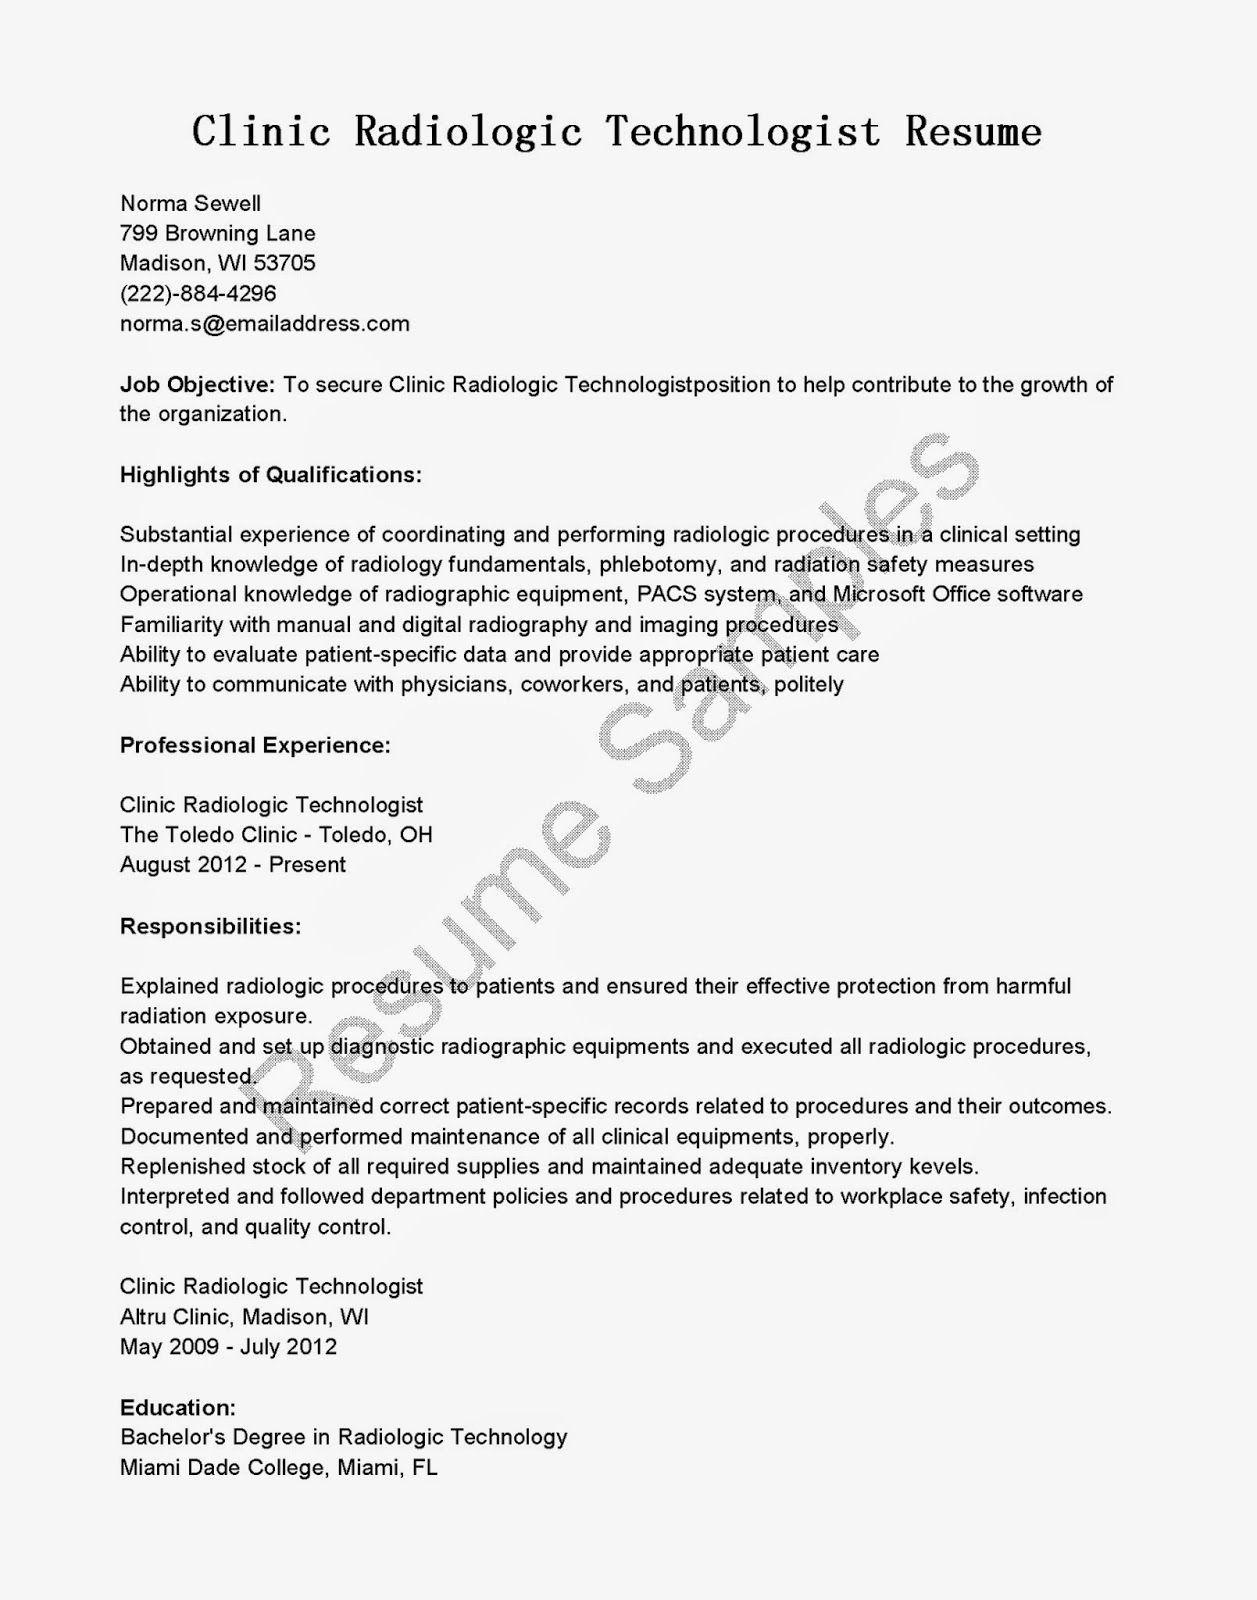 Use this FREE Sample Clinic Radiologic Technologist Resume